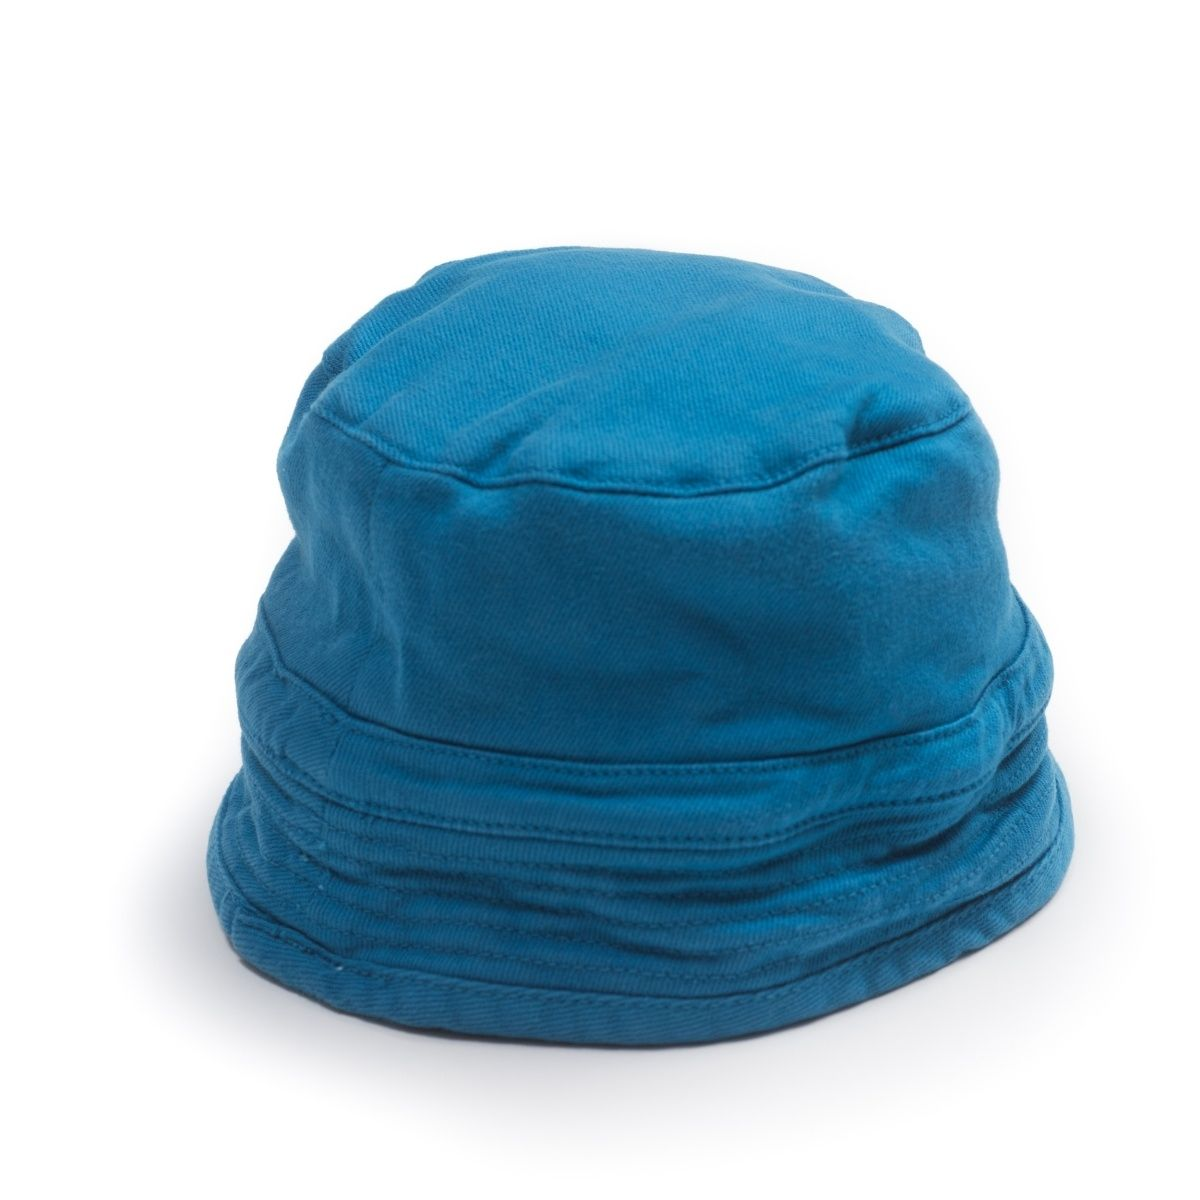 Kapelusz Ascot niebieski - Bonton